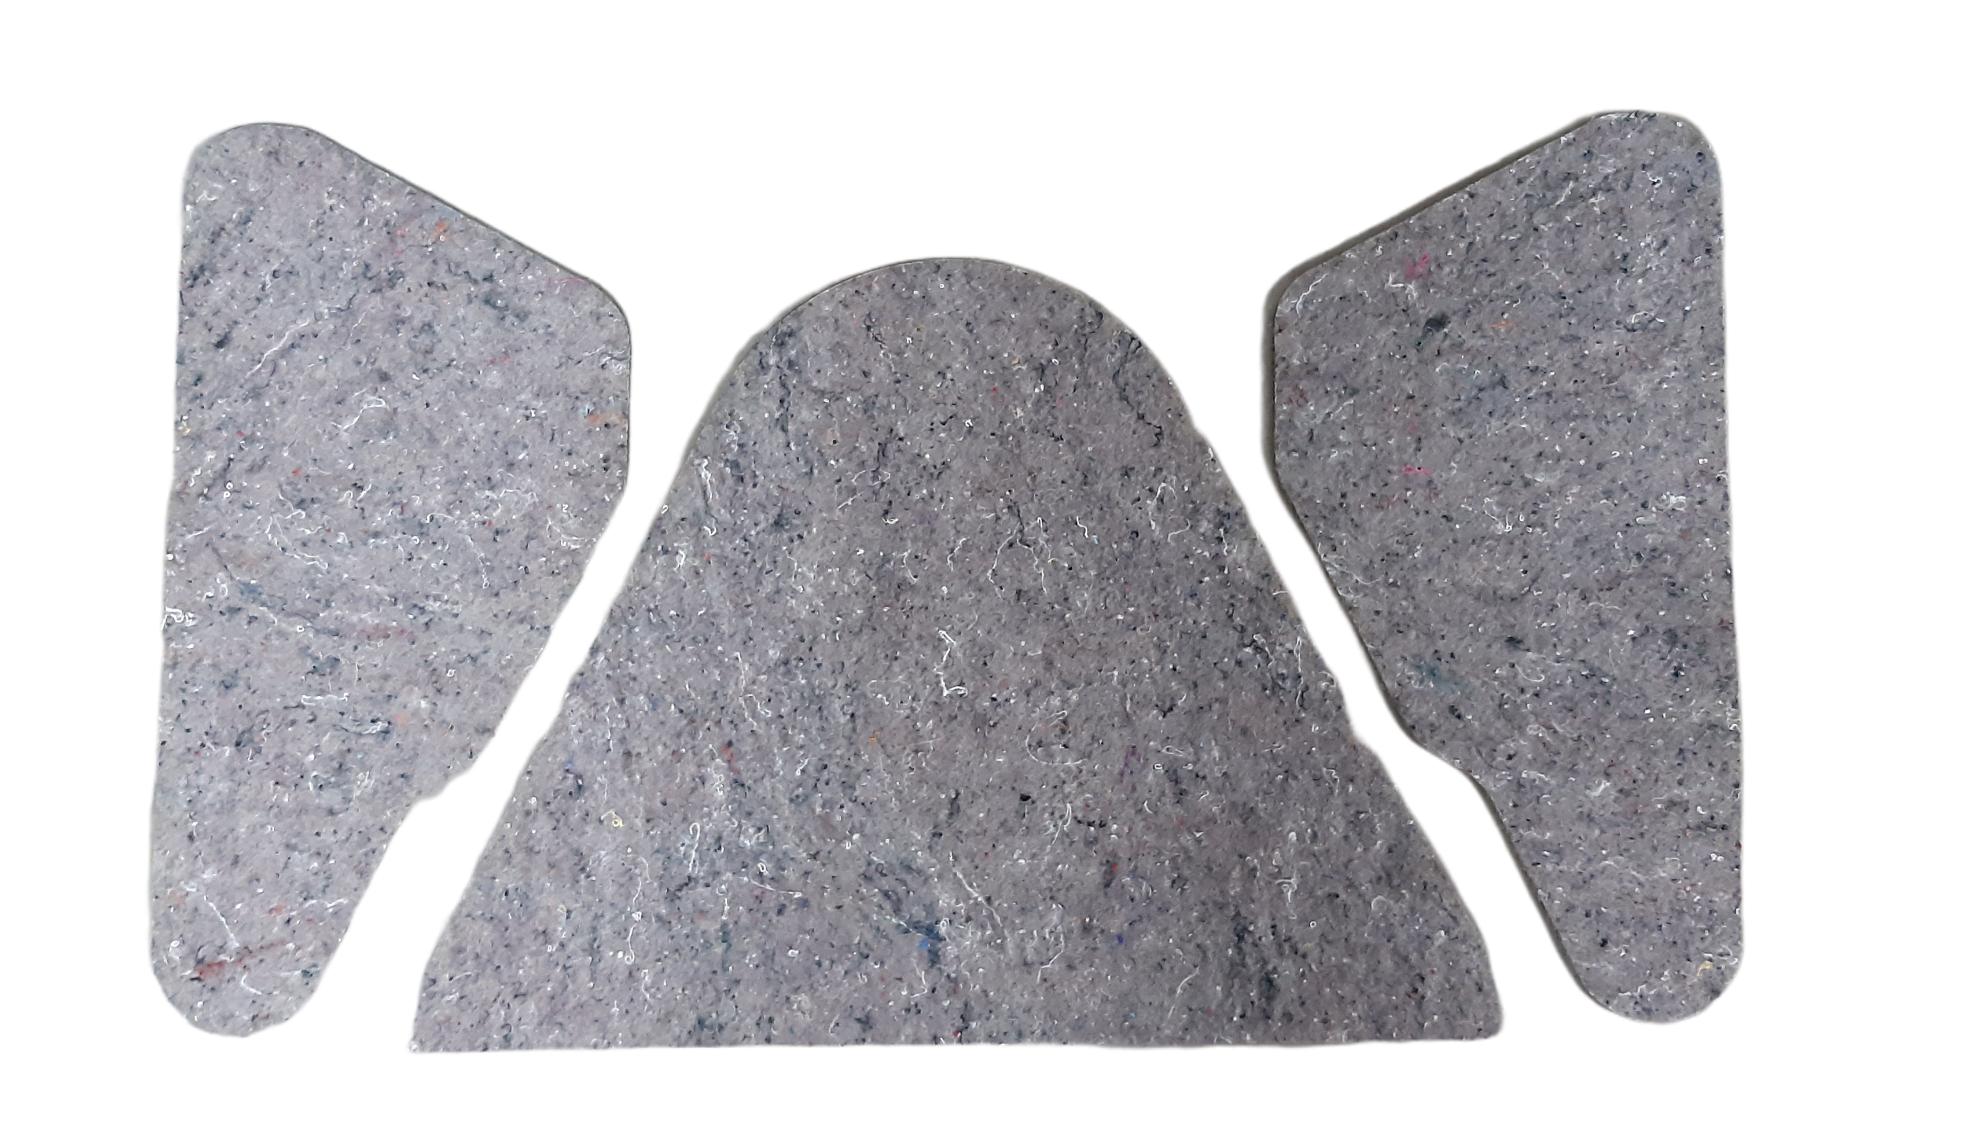 2 CV Dämmung Heckklappe, 3 teilig, in einem ca:4 mm dickem Propylat nicht selbstklebend